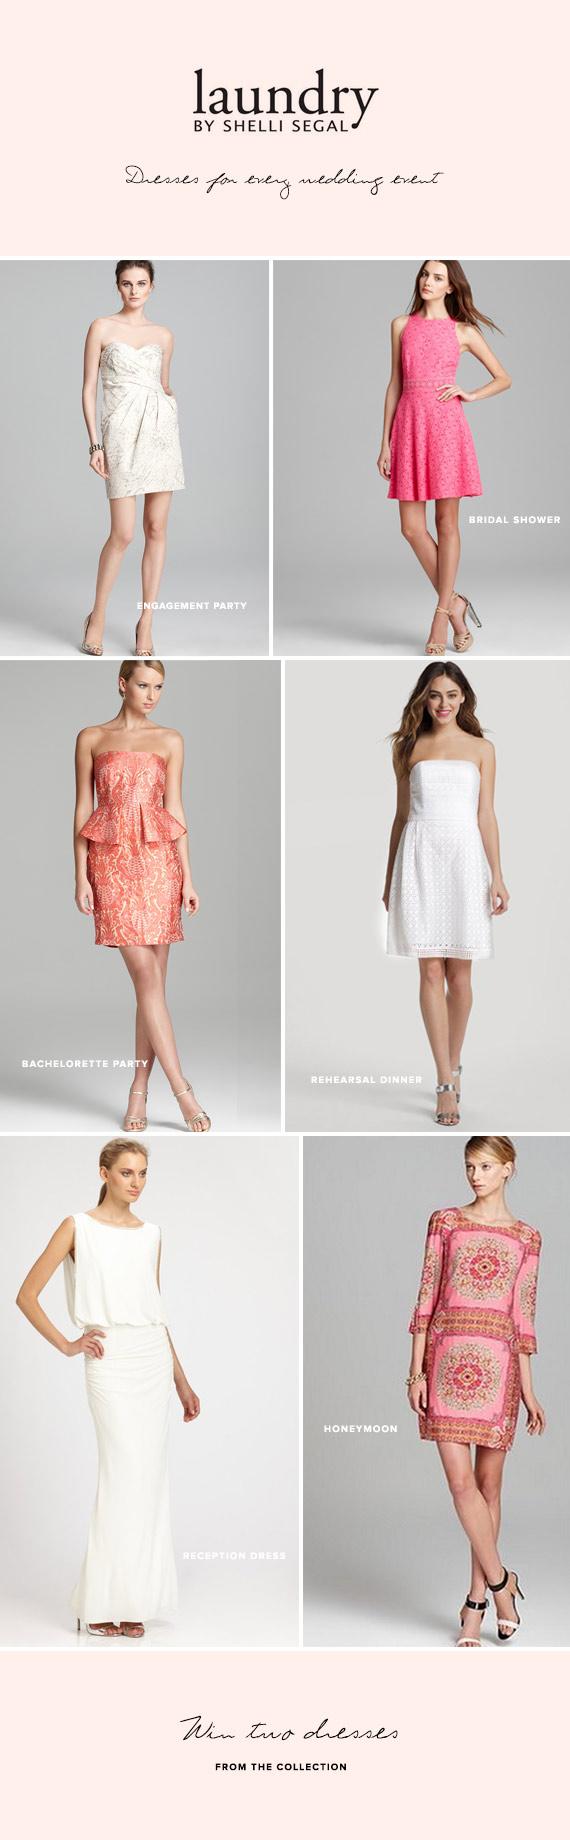 Laundry By Shelli Segal Giveaway Wedding Giveaways Wedding Pinterest Fashion Beauty